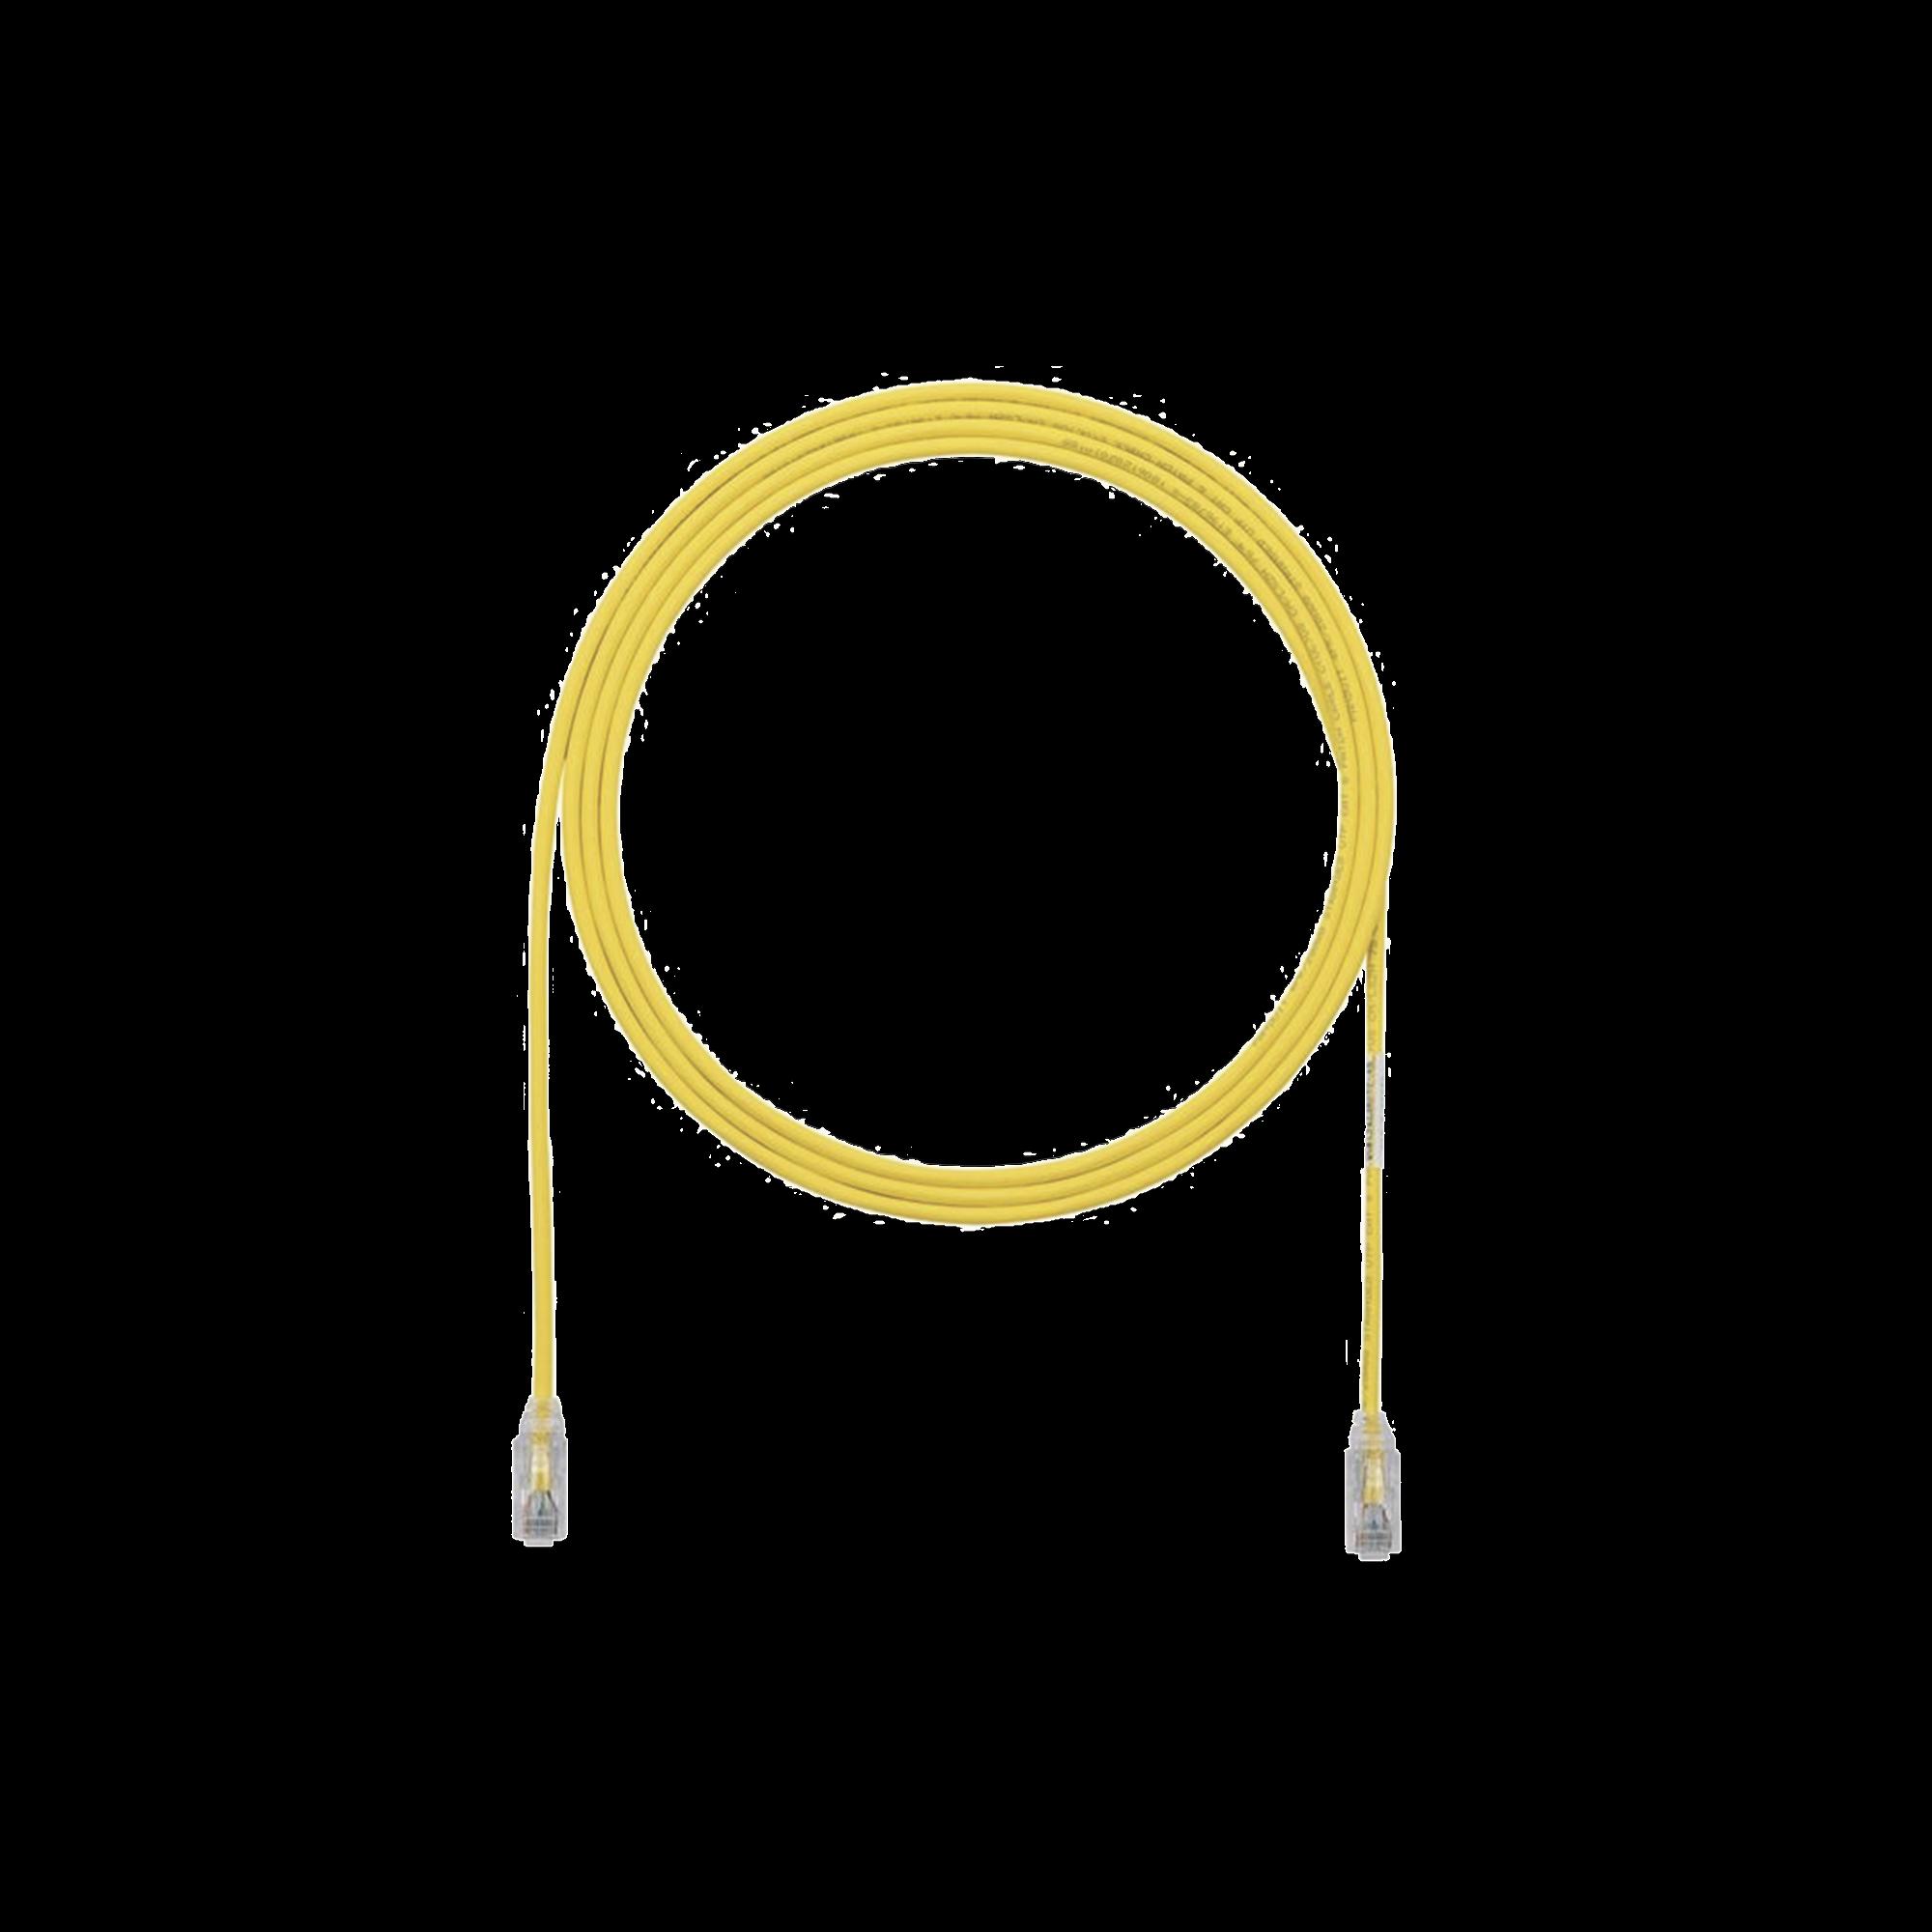 Cable de Parcheo TX6, UTP Cat6, Diámetro Reducido (28AWG), Color Amarillo, 3ft